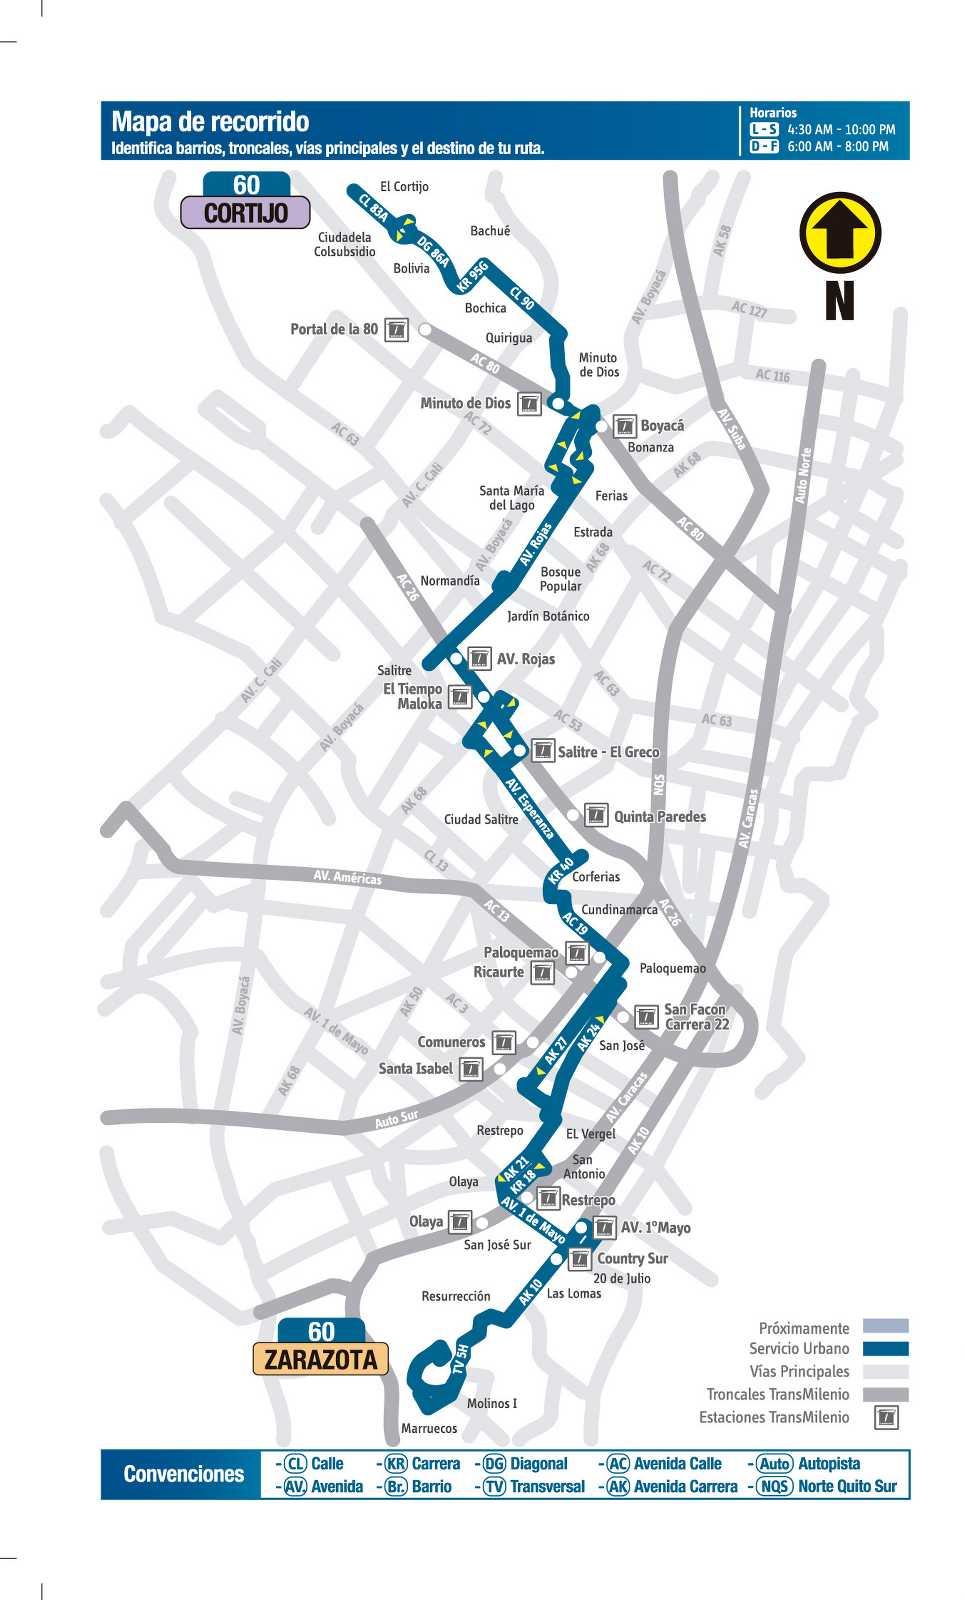 Ruta SITP: 60 Cortijo ↔ Zarazota (mapa)